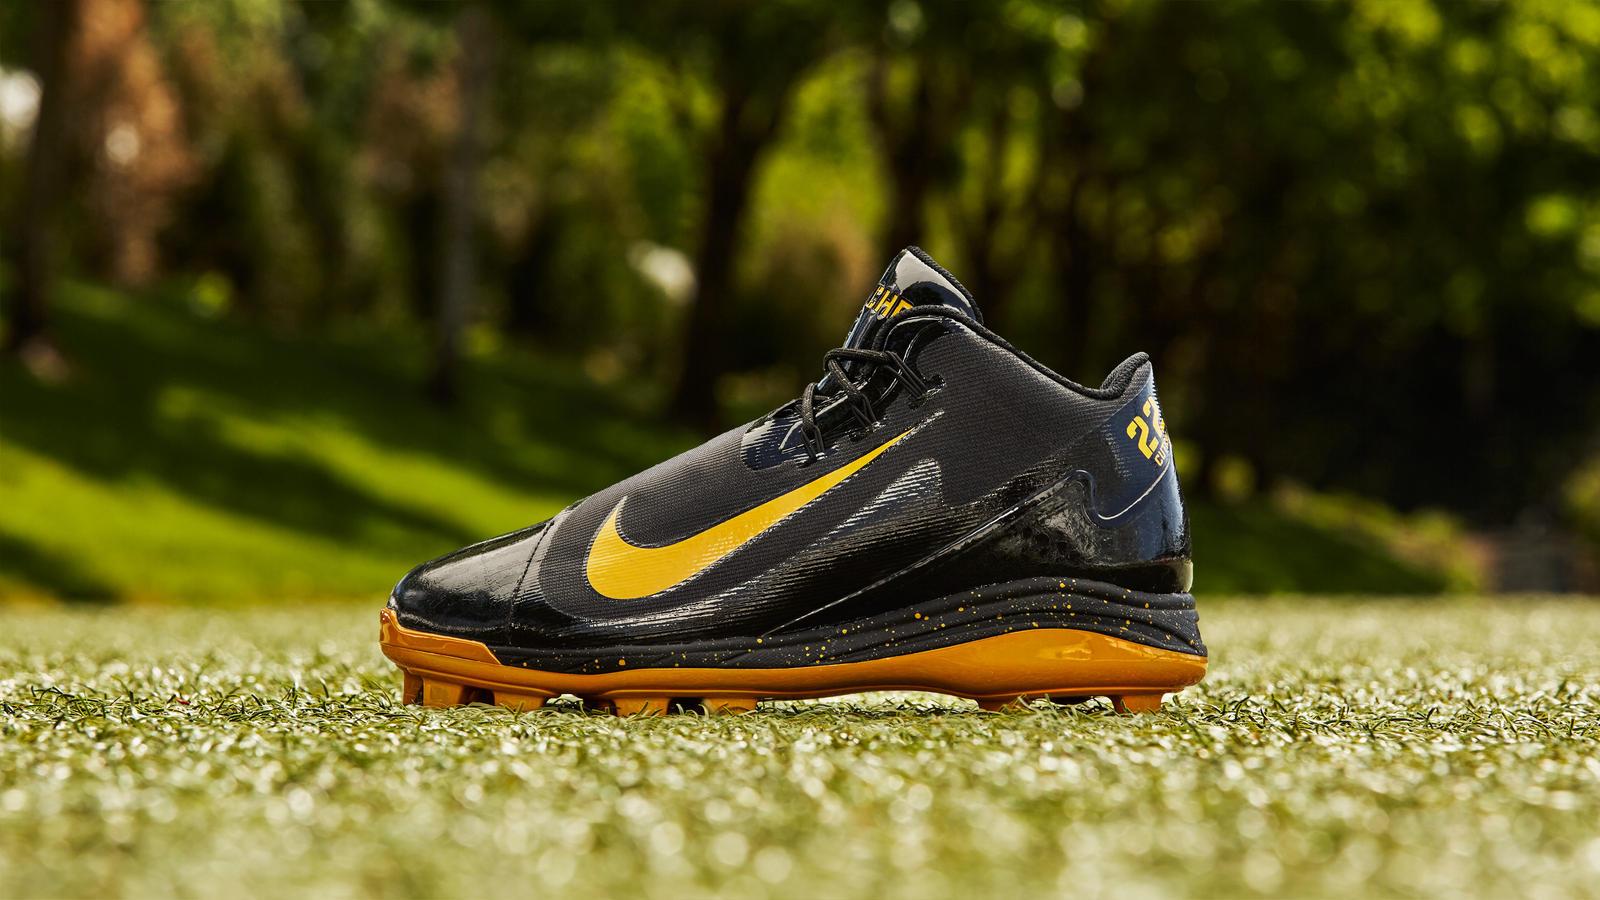 Nike Air Swingman Legend PE